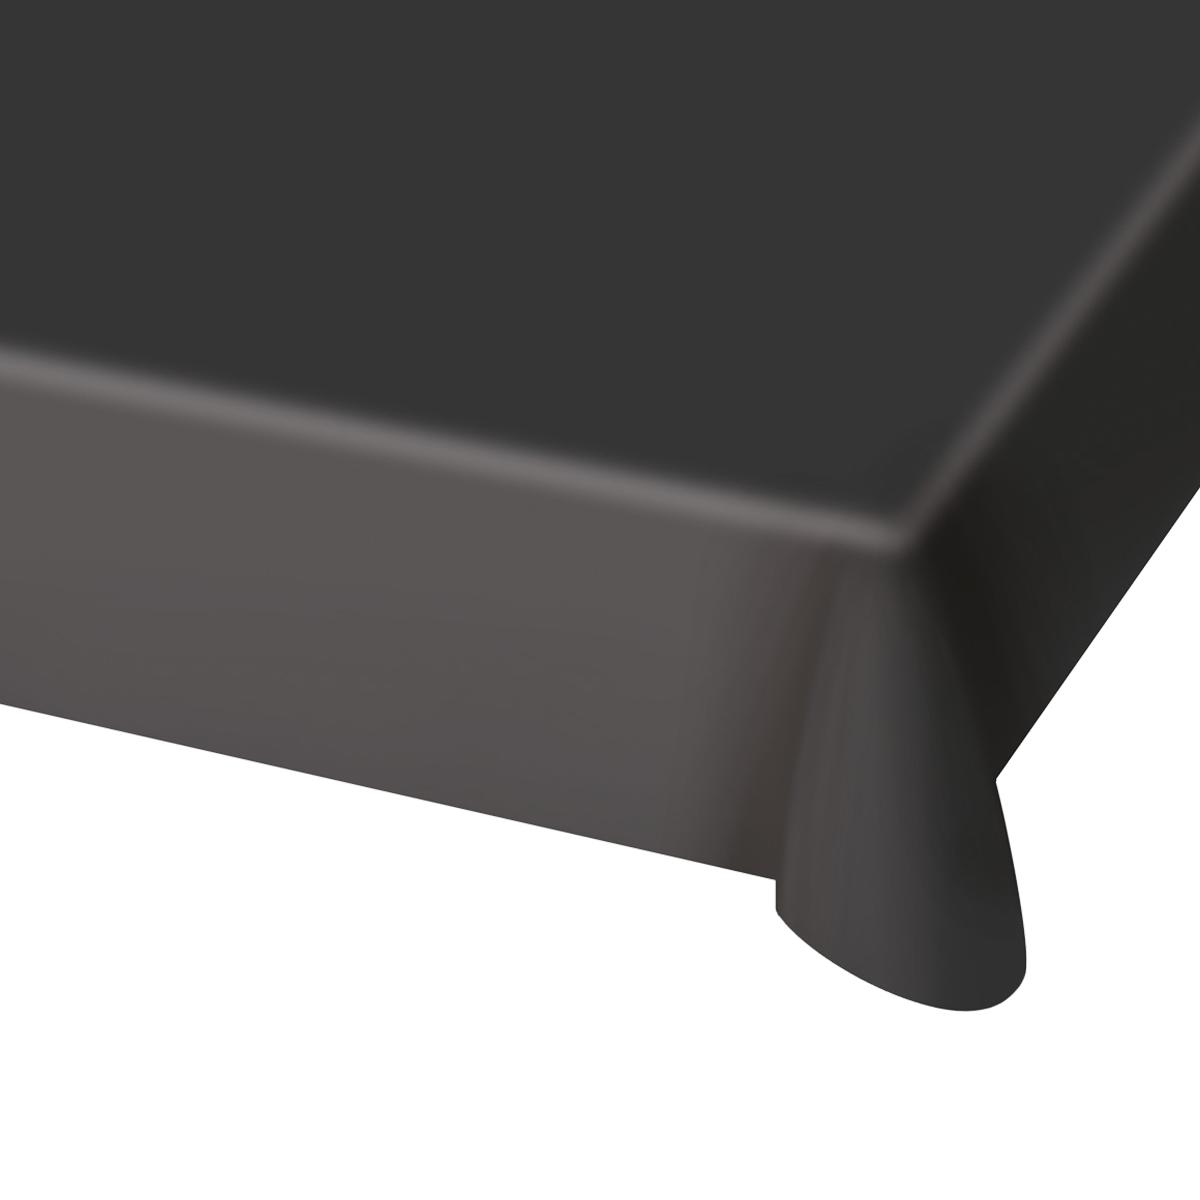 Duk, svart 180x130 cm